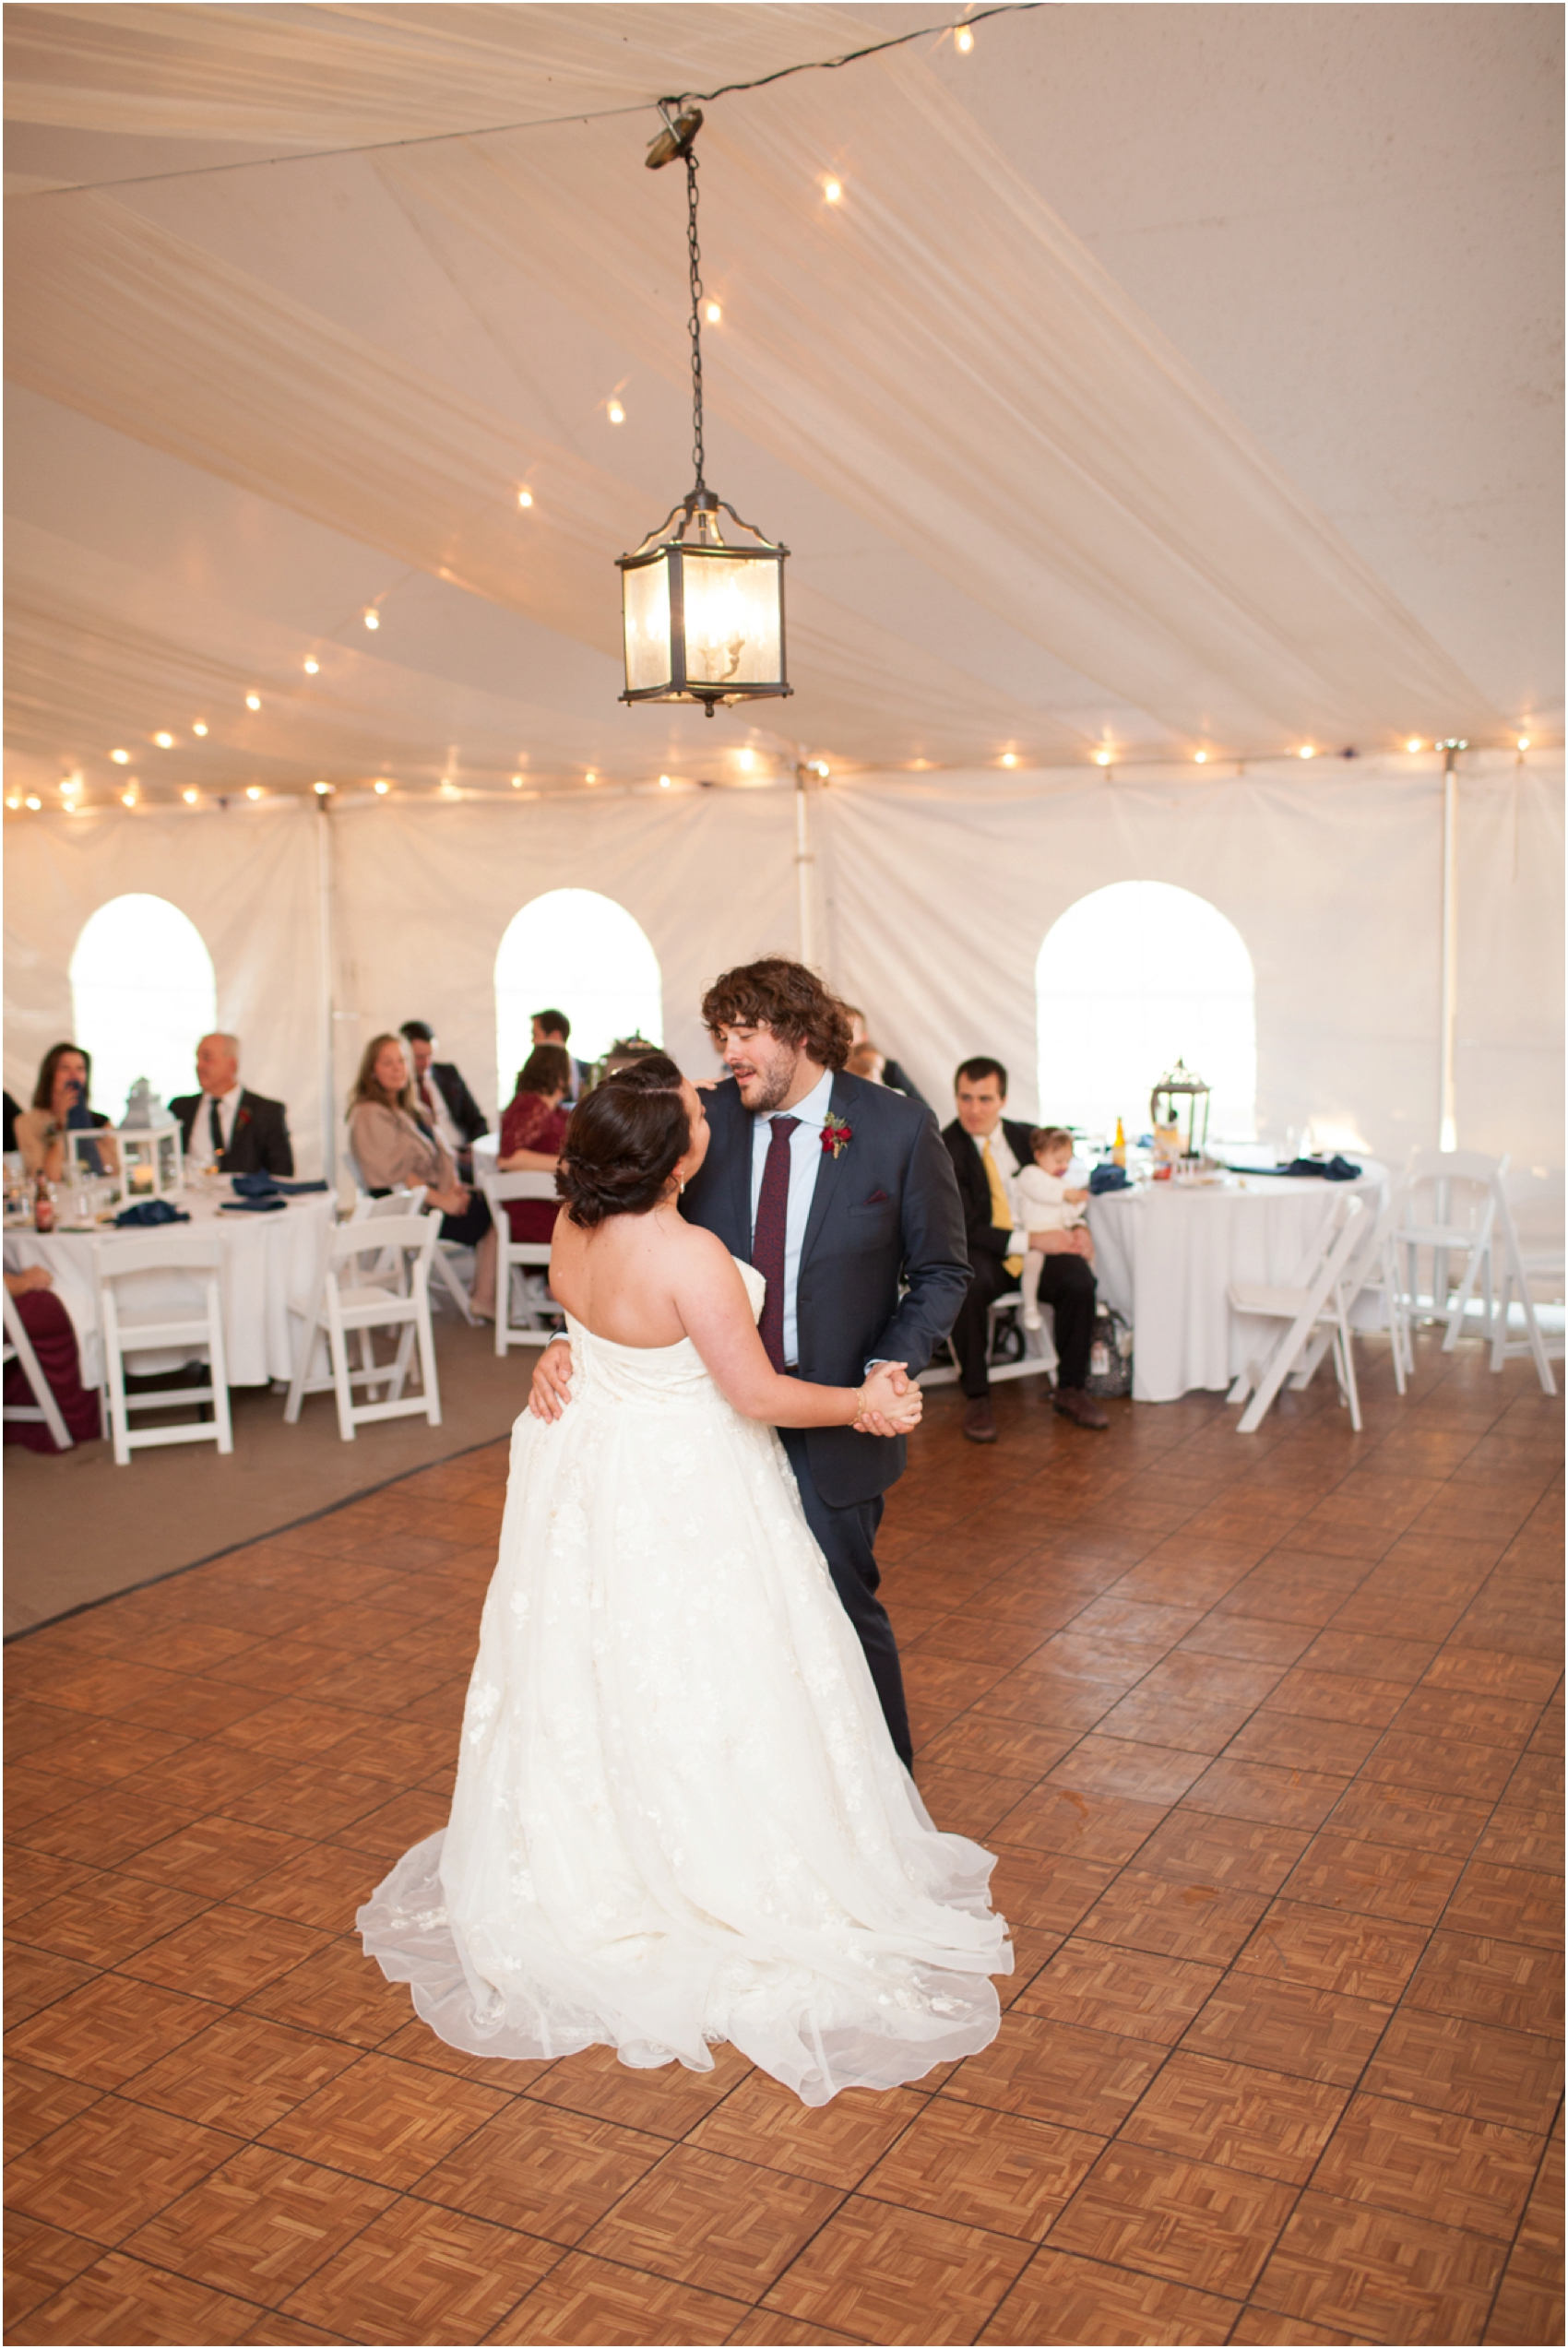 On-Sunny-Slope-Farm-Fall-Virginia-Wedding-3449.jpg